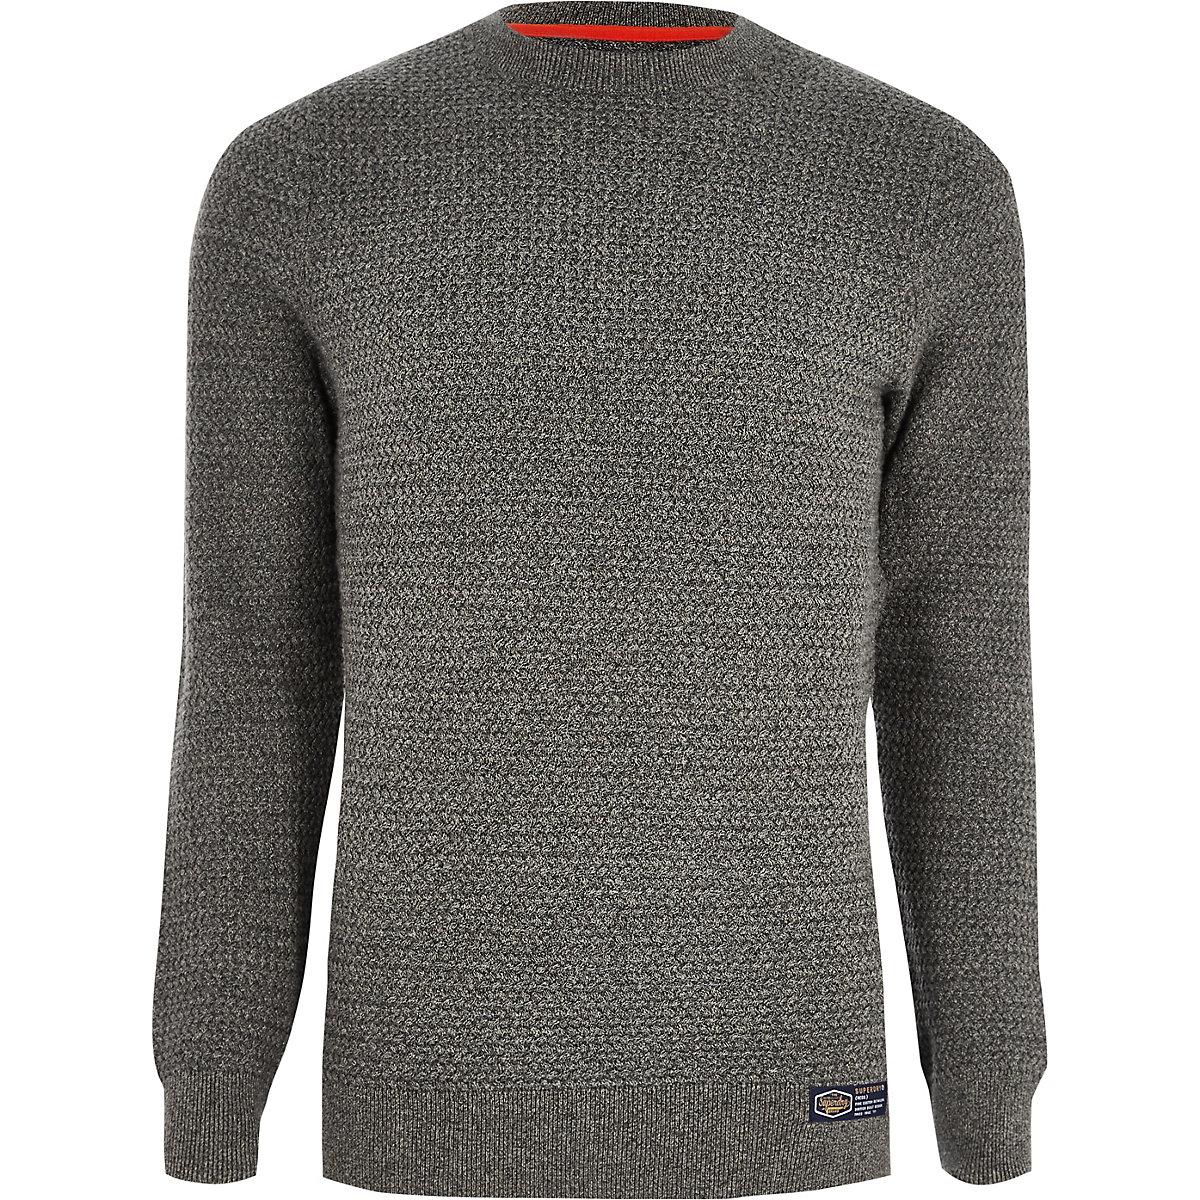 Superdry grey textured jumper